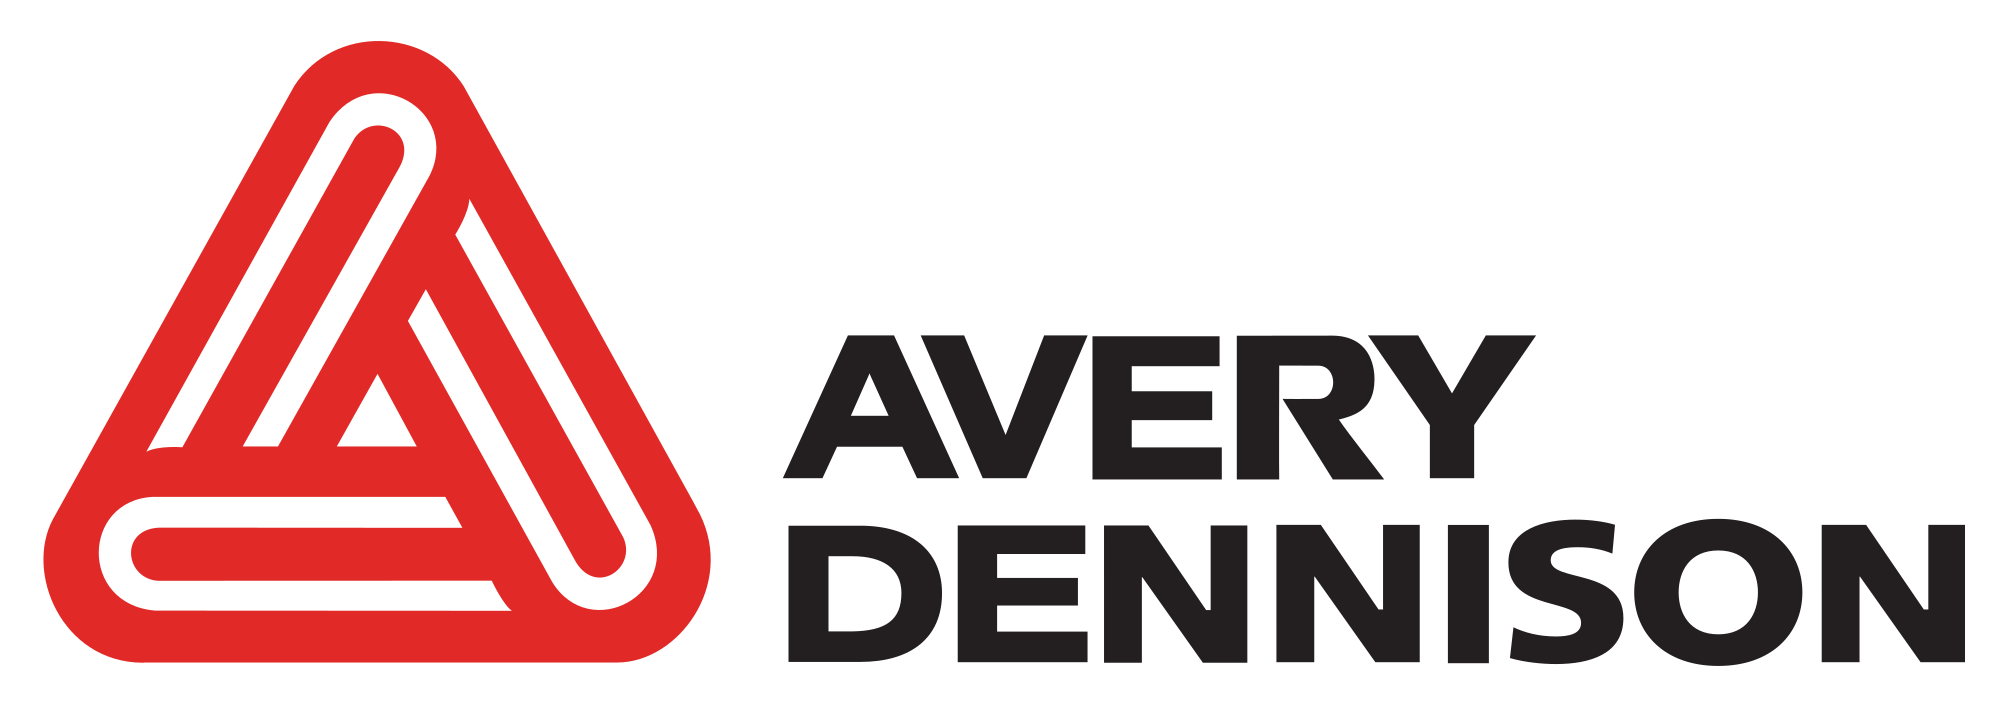 Avery Dennison®